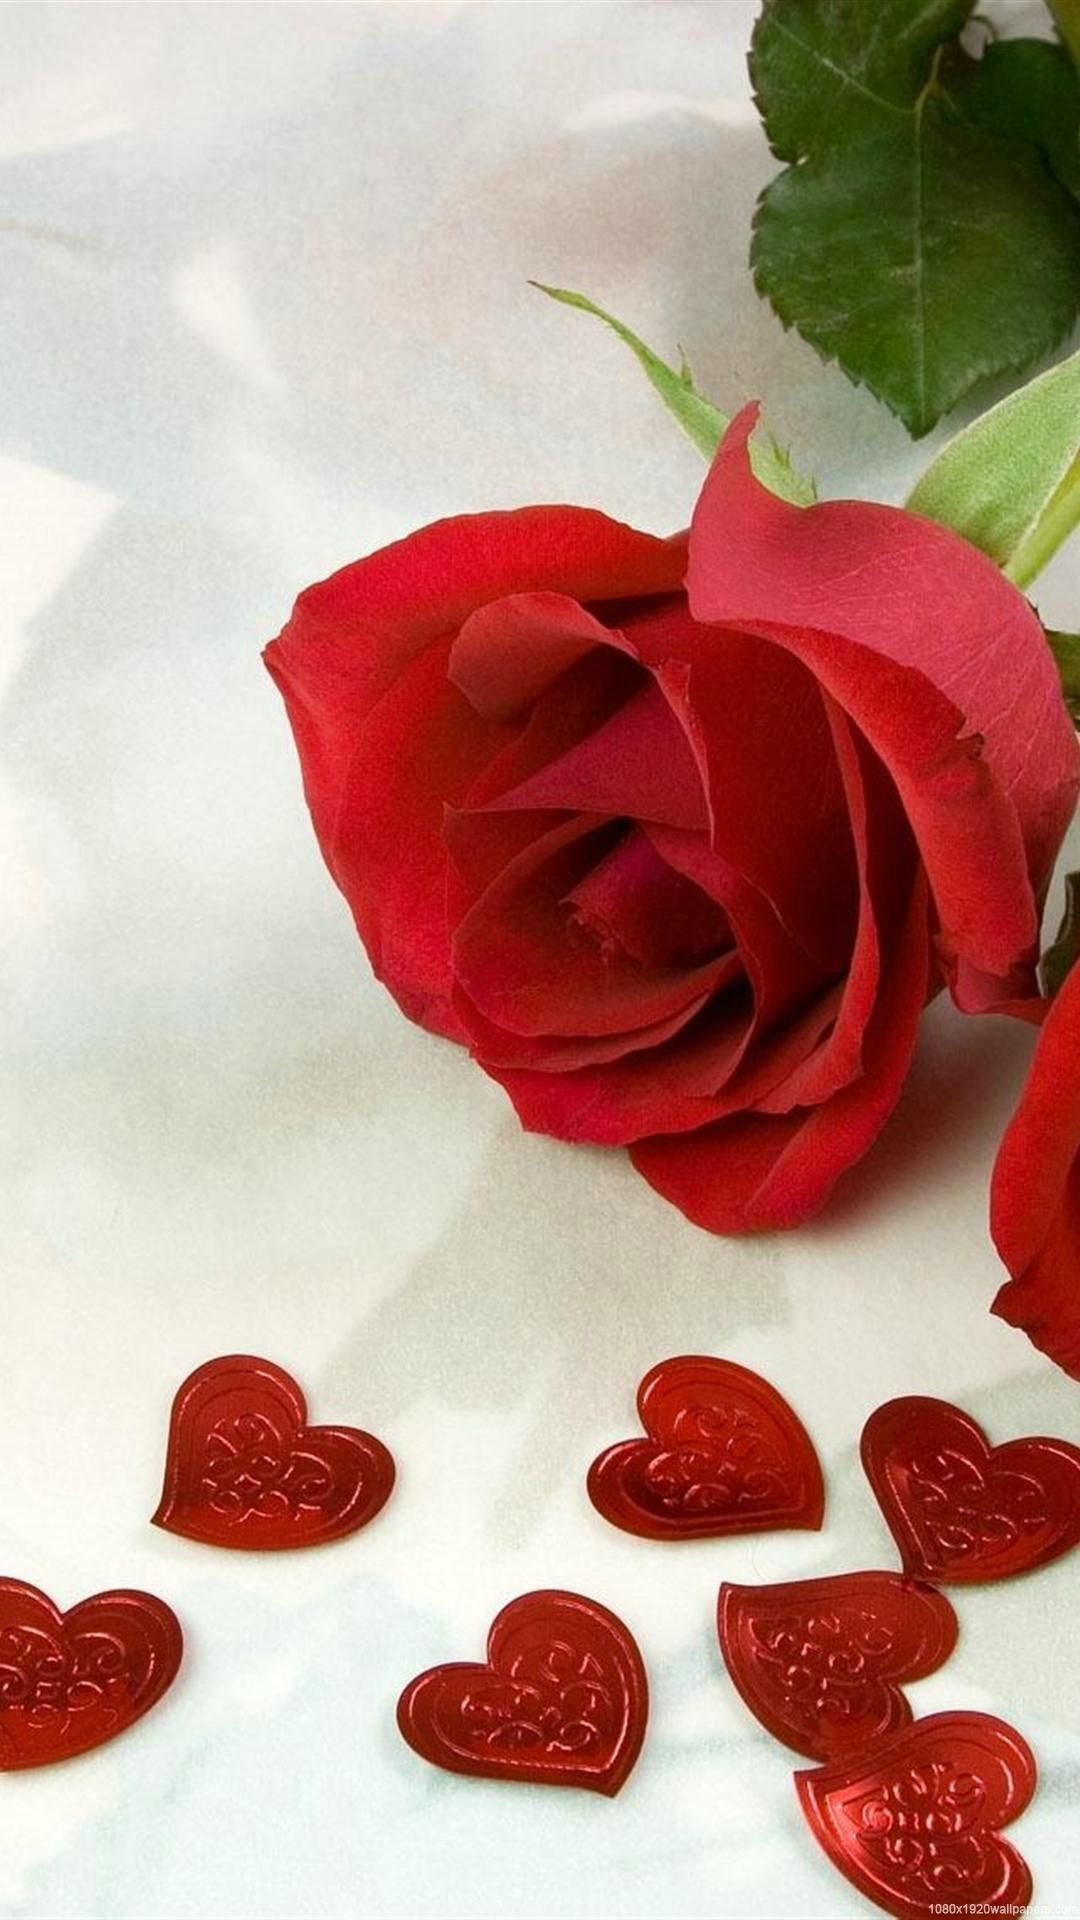 Love Wallpaper Hd Resolution Hupages Download Iphone Wallpapers Heart Wallpaper Hd Heart Wallpaper Flower Phone Wallpaper